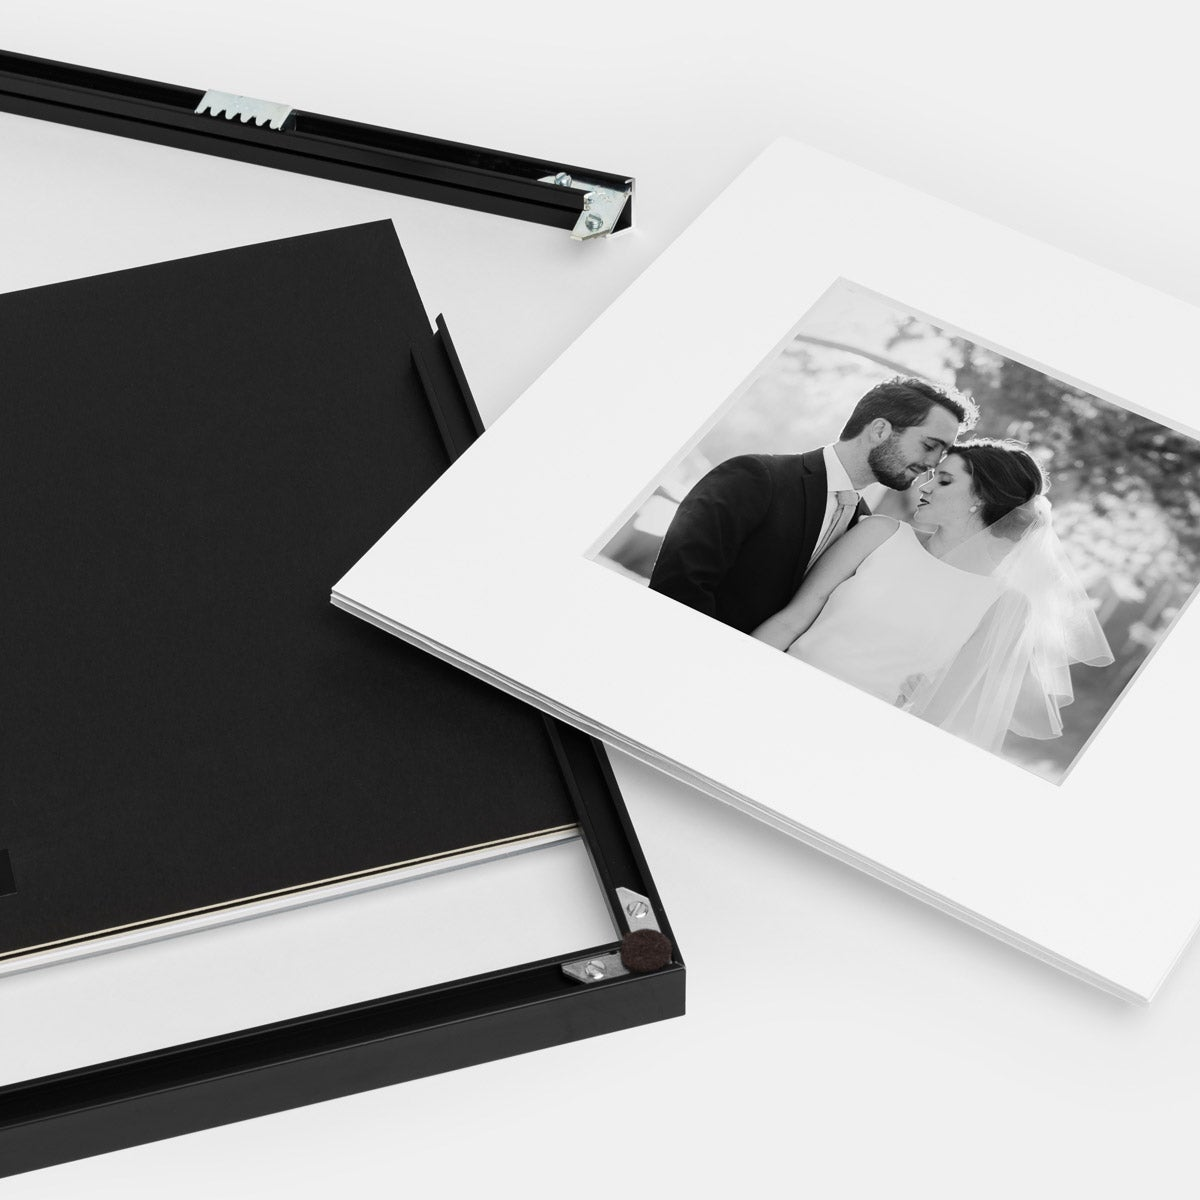 Matted Print Refills for Frames